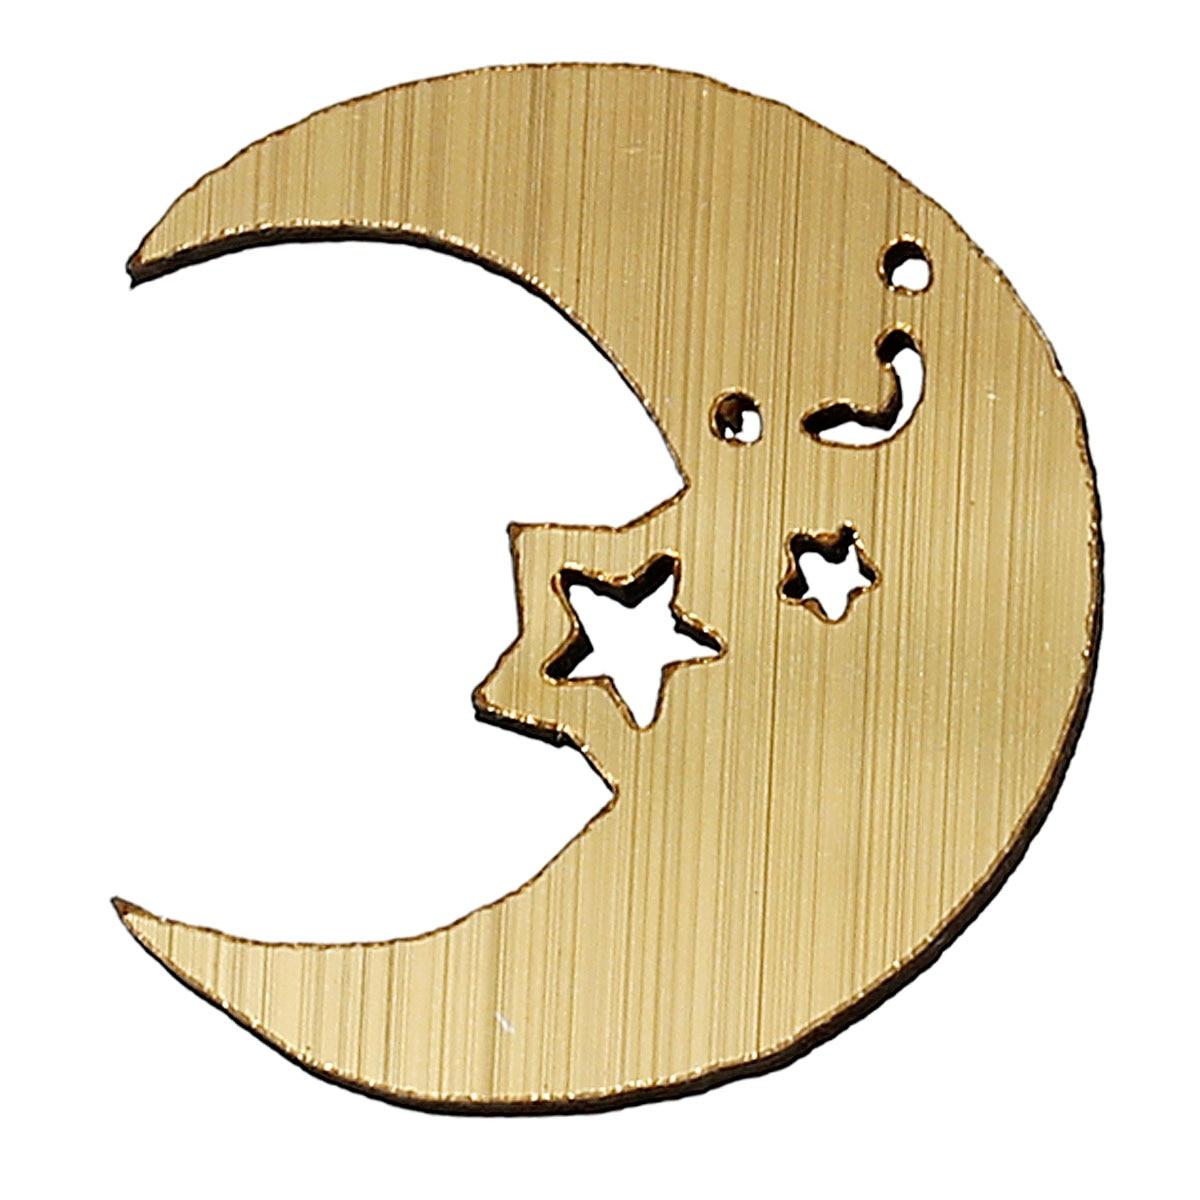 Wood Cabochons Scrapbooking Embellishments Findings Moon Golden Star Hollow 27mm(1 1/8)x 24mm(1),50 PCs 2015 new